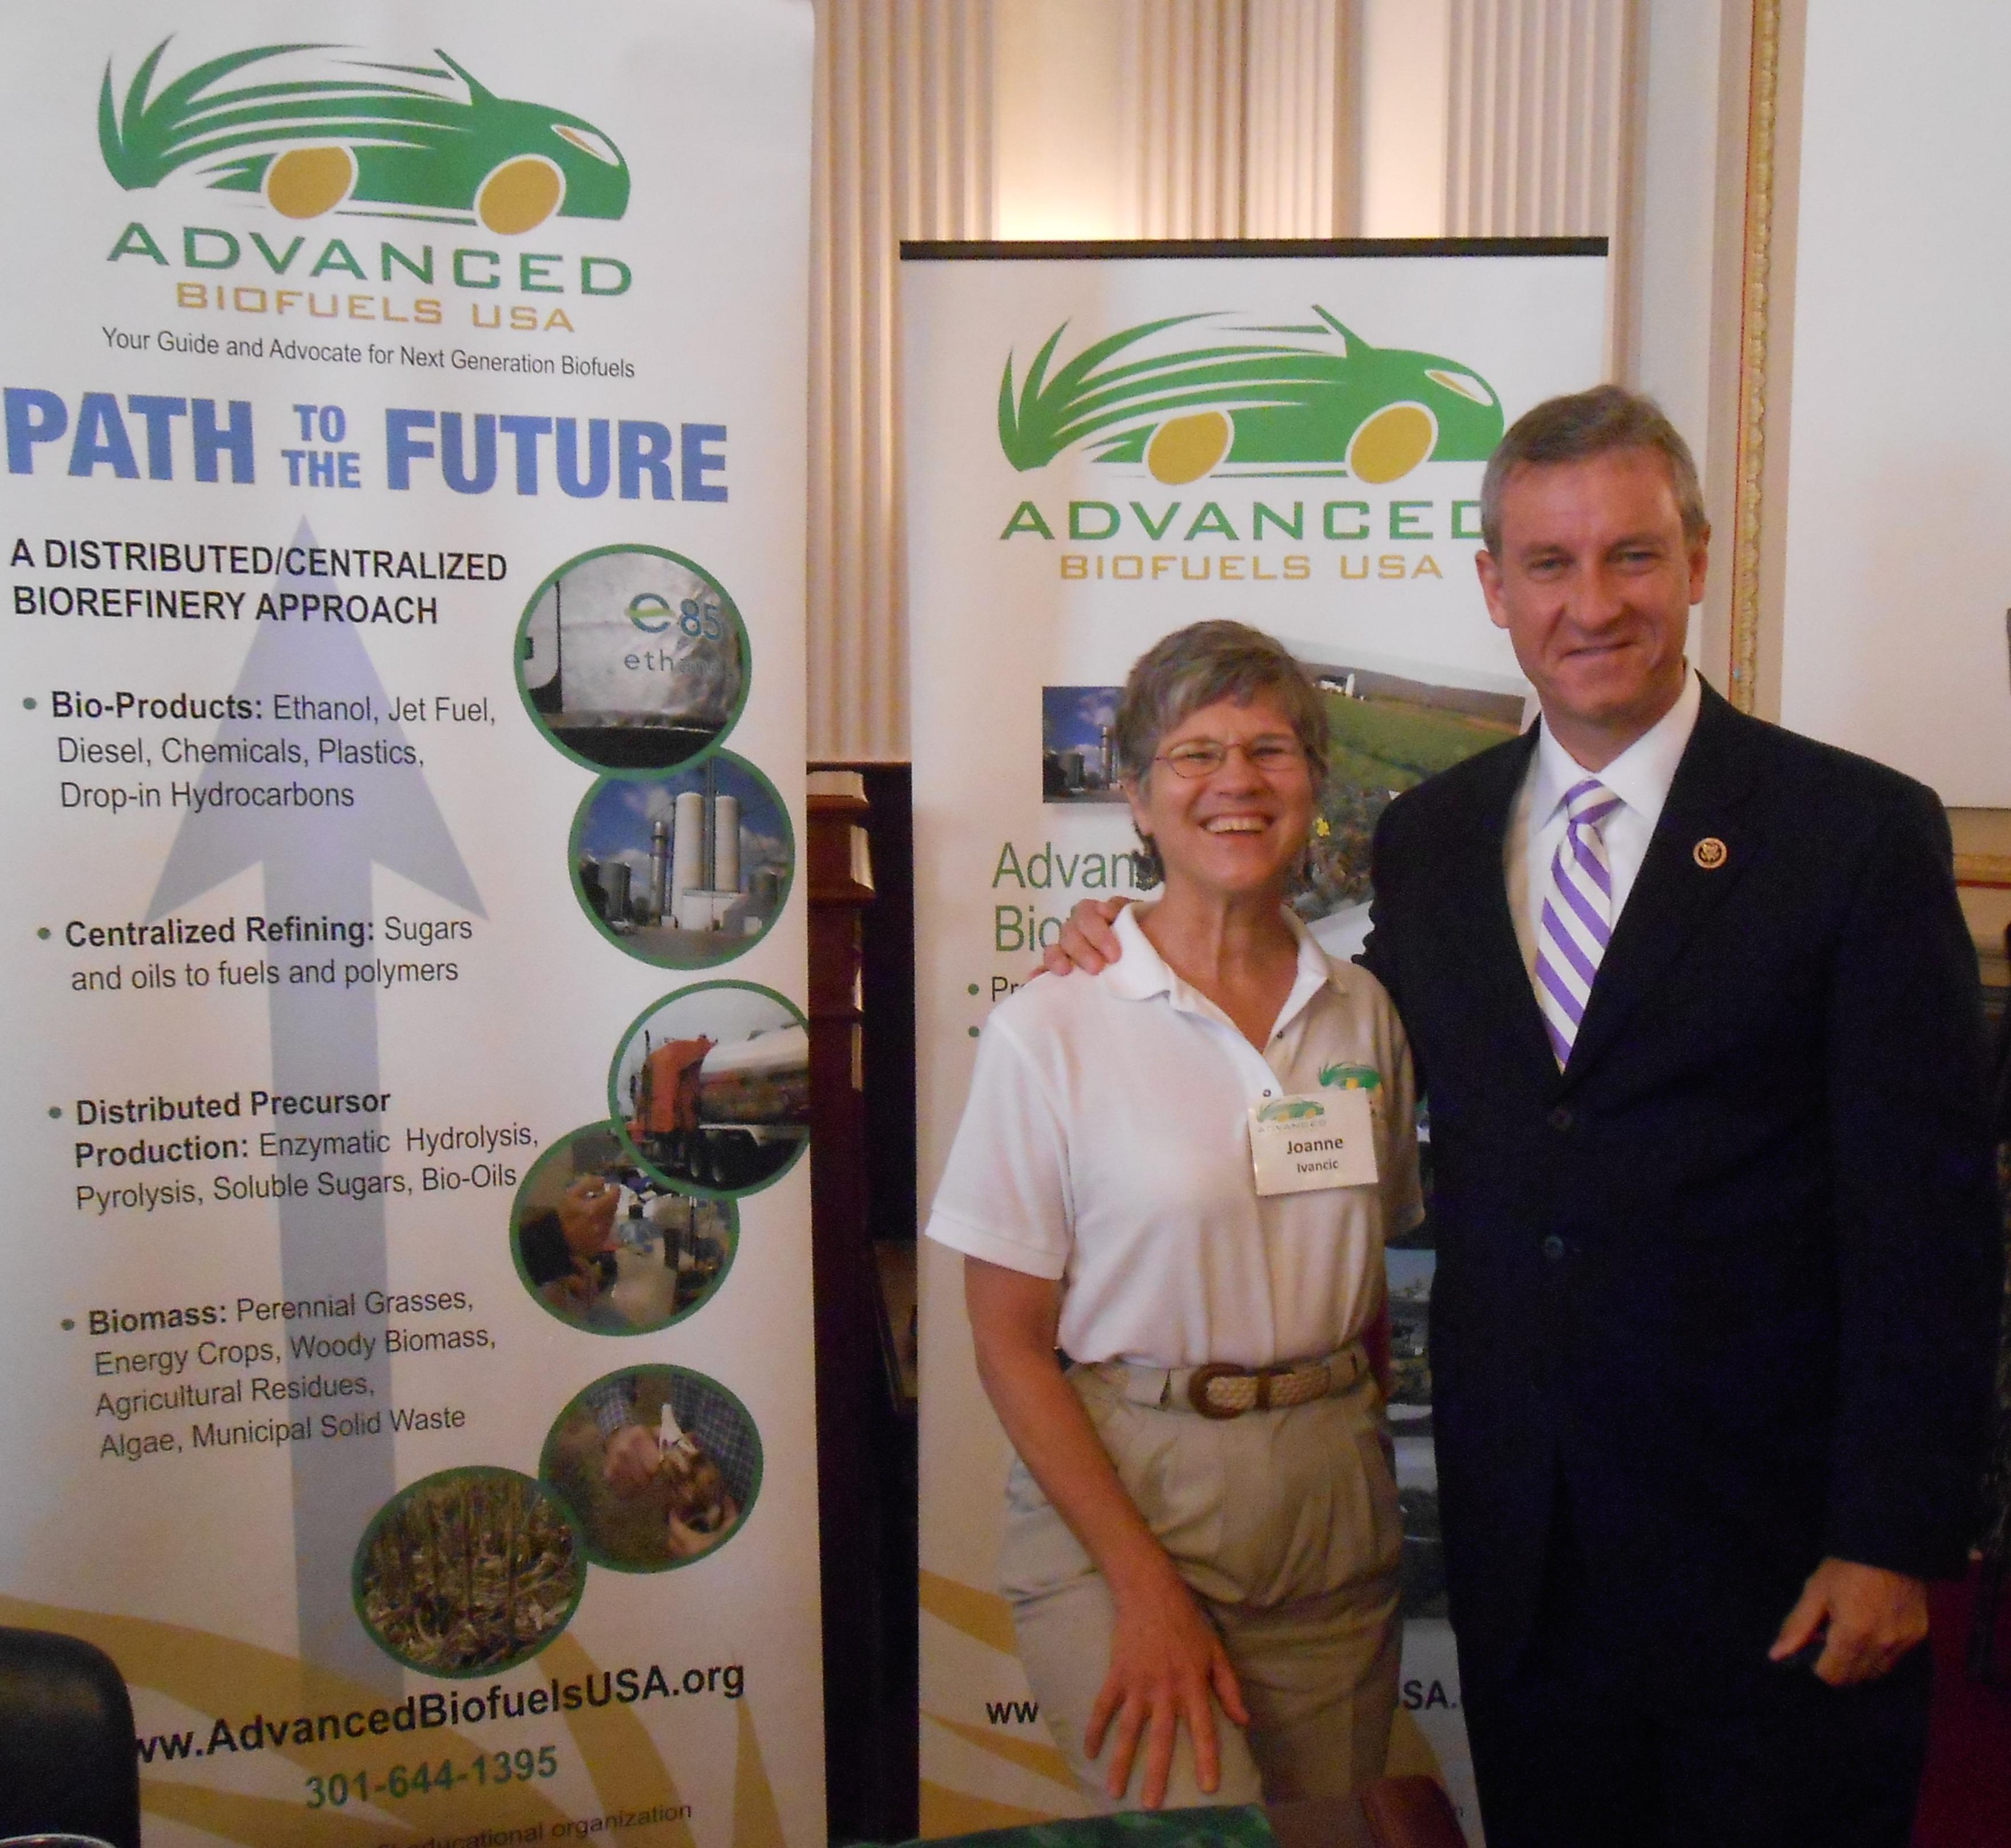 Joanne Ivancic with Congressman Matt Cartwright